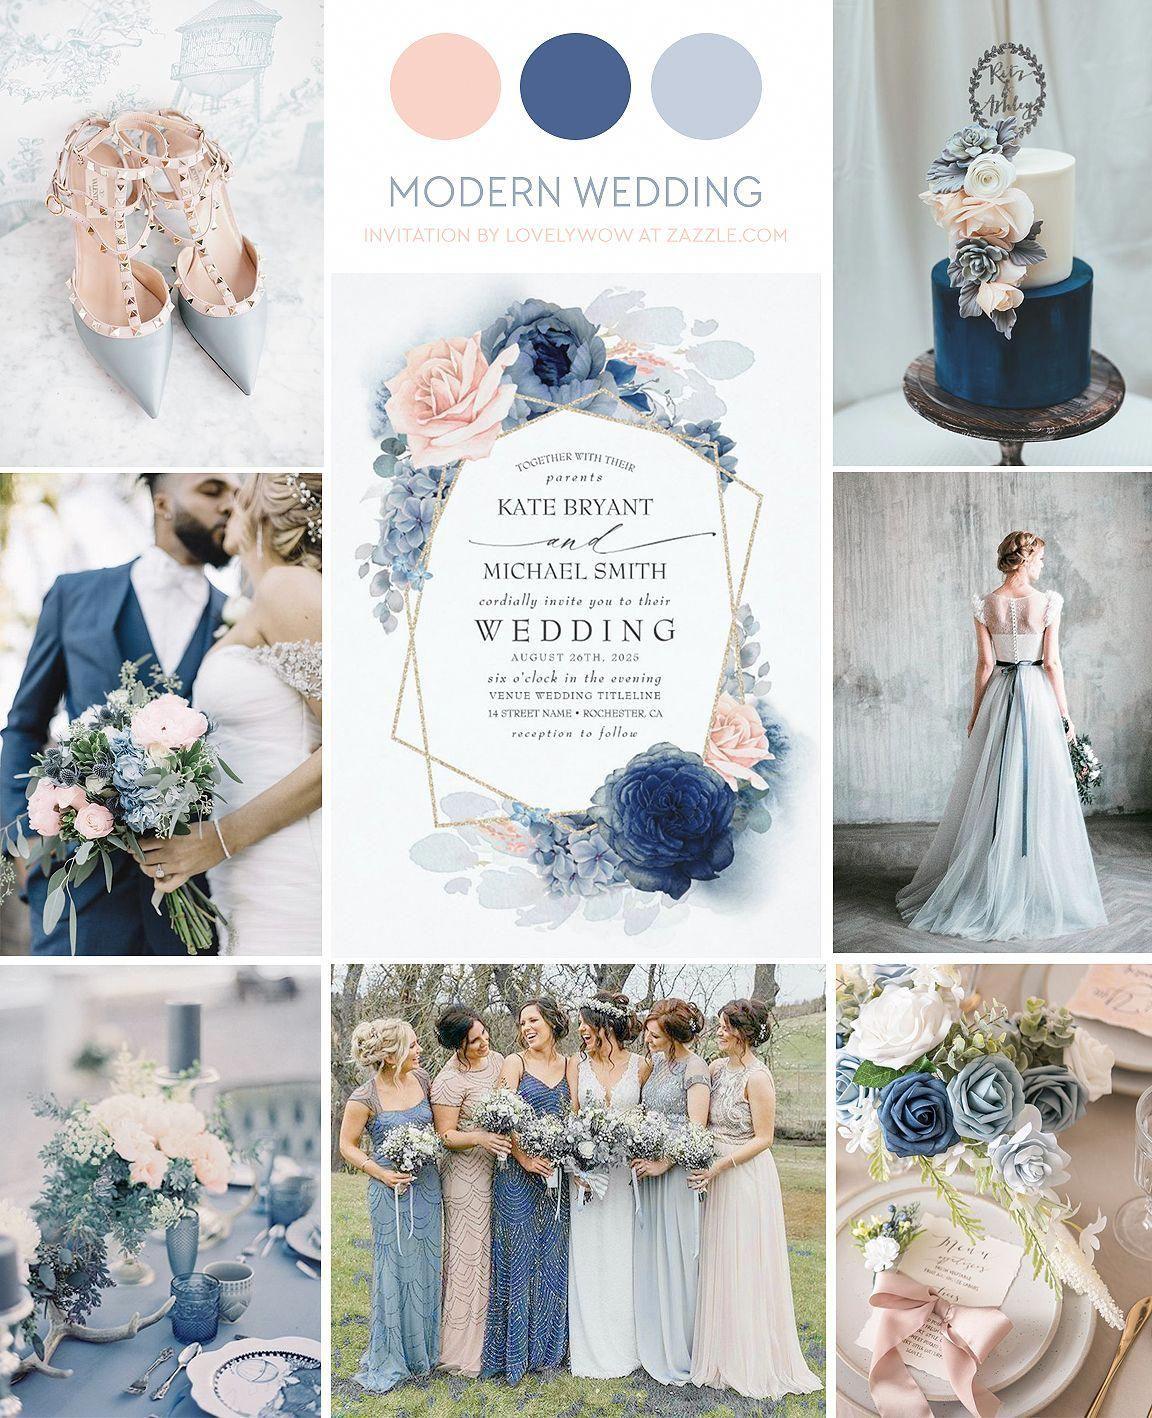 Blush Dusty and Navy Blue Floral Wedding Invitation   Zazzle.com -   14 wedding Blue navy ideas